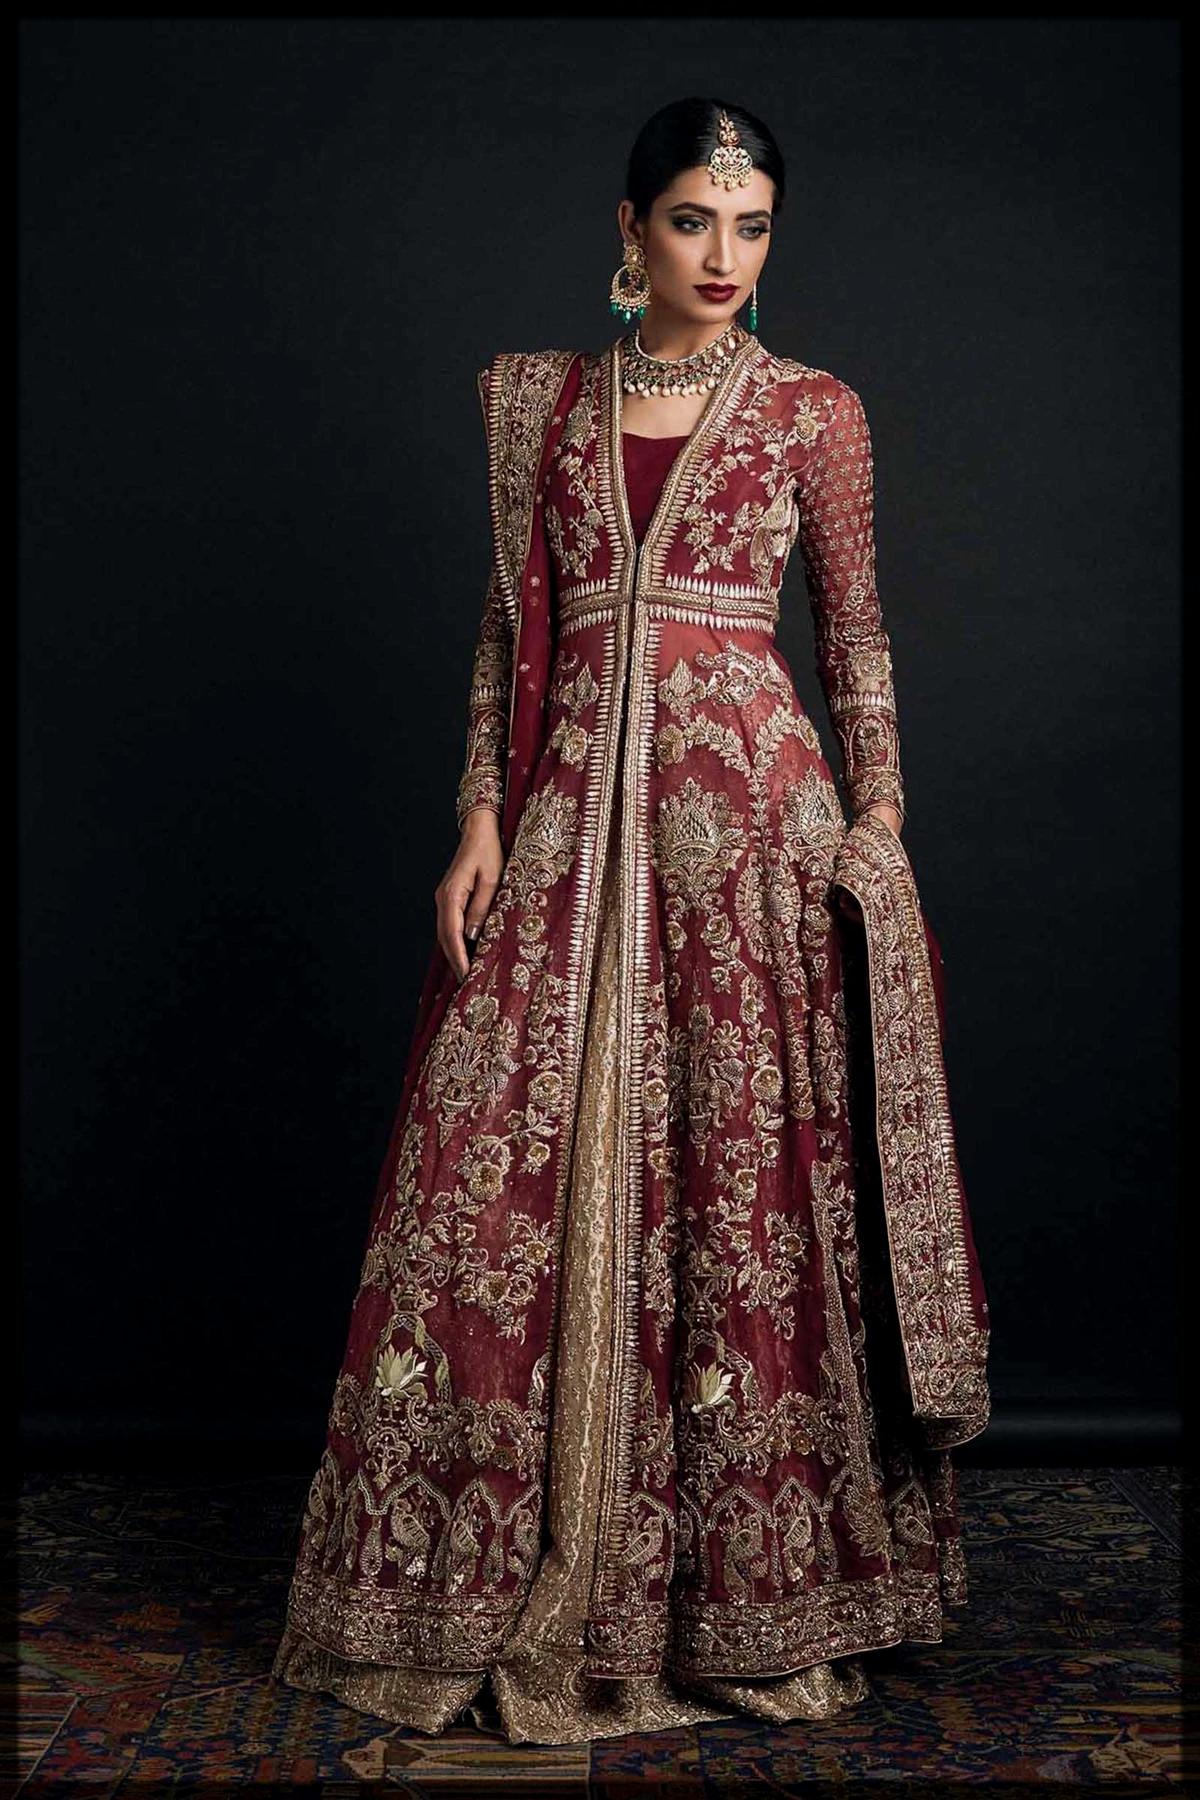 Ravishing Front Open Embroidered Dress for Barat Brides